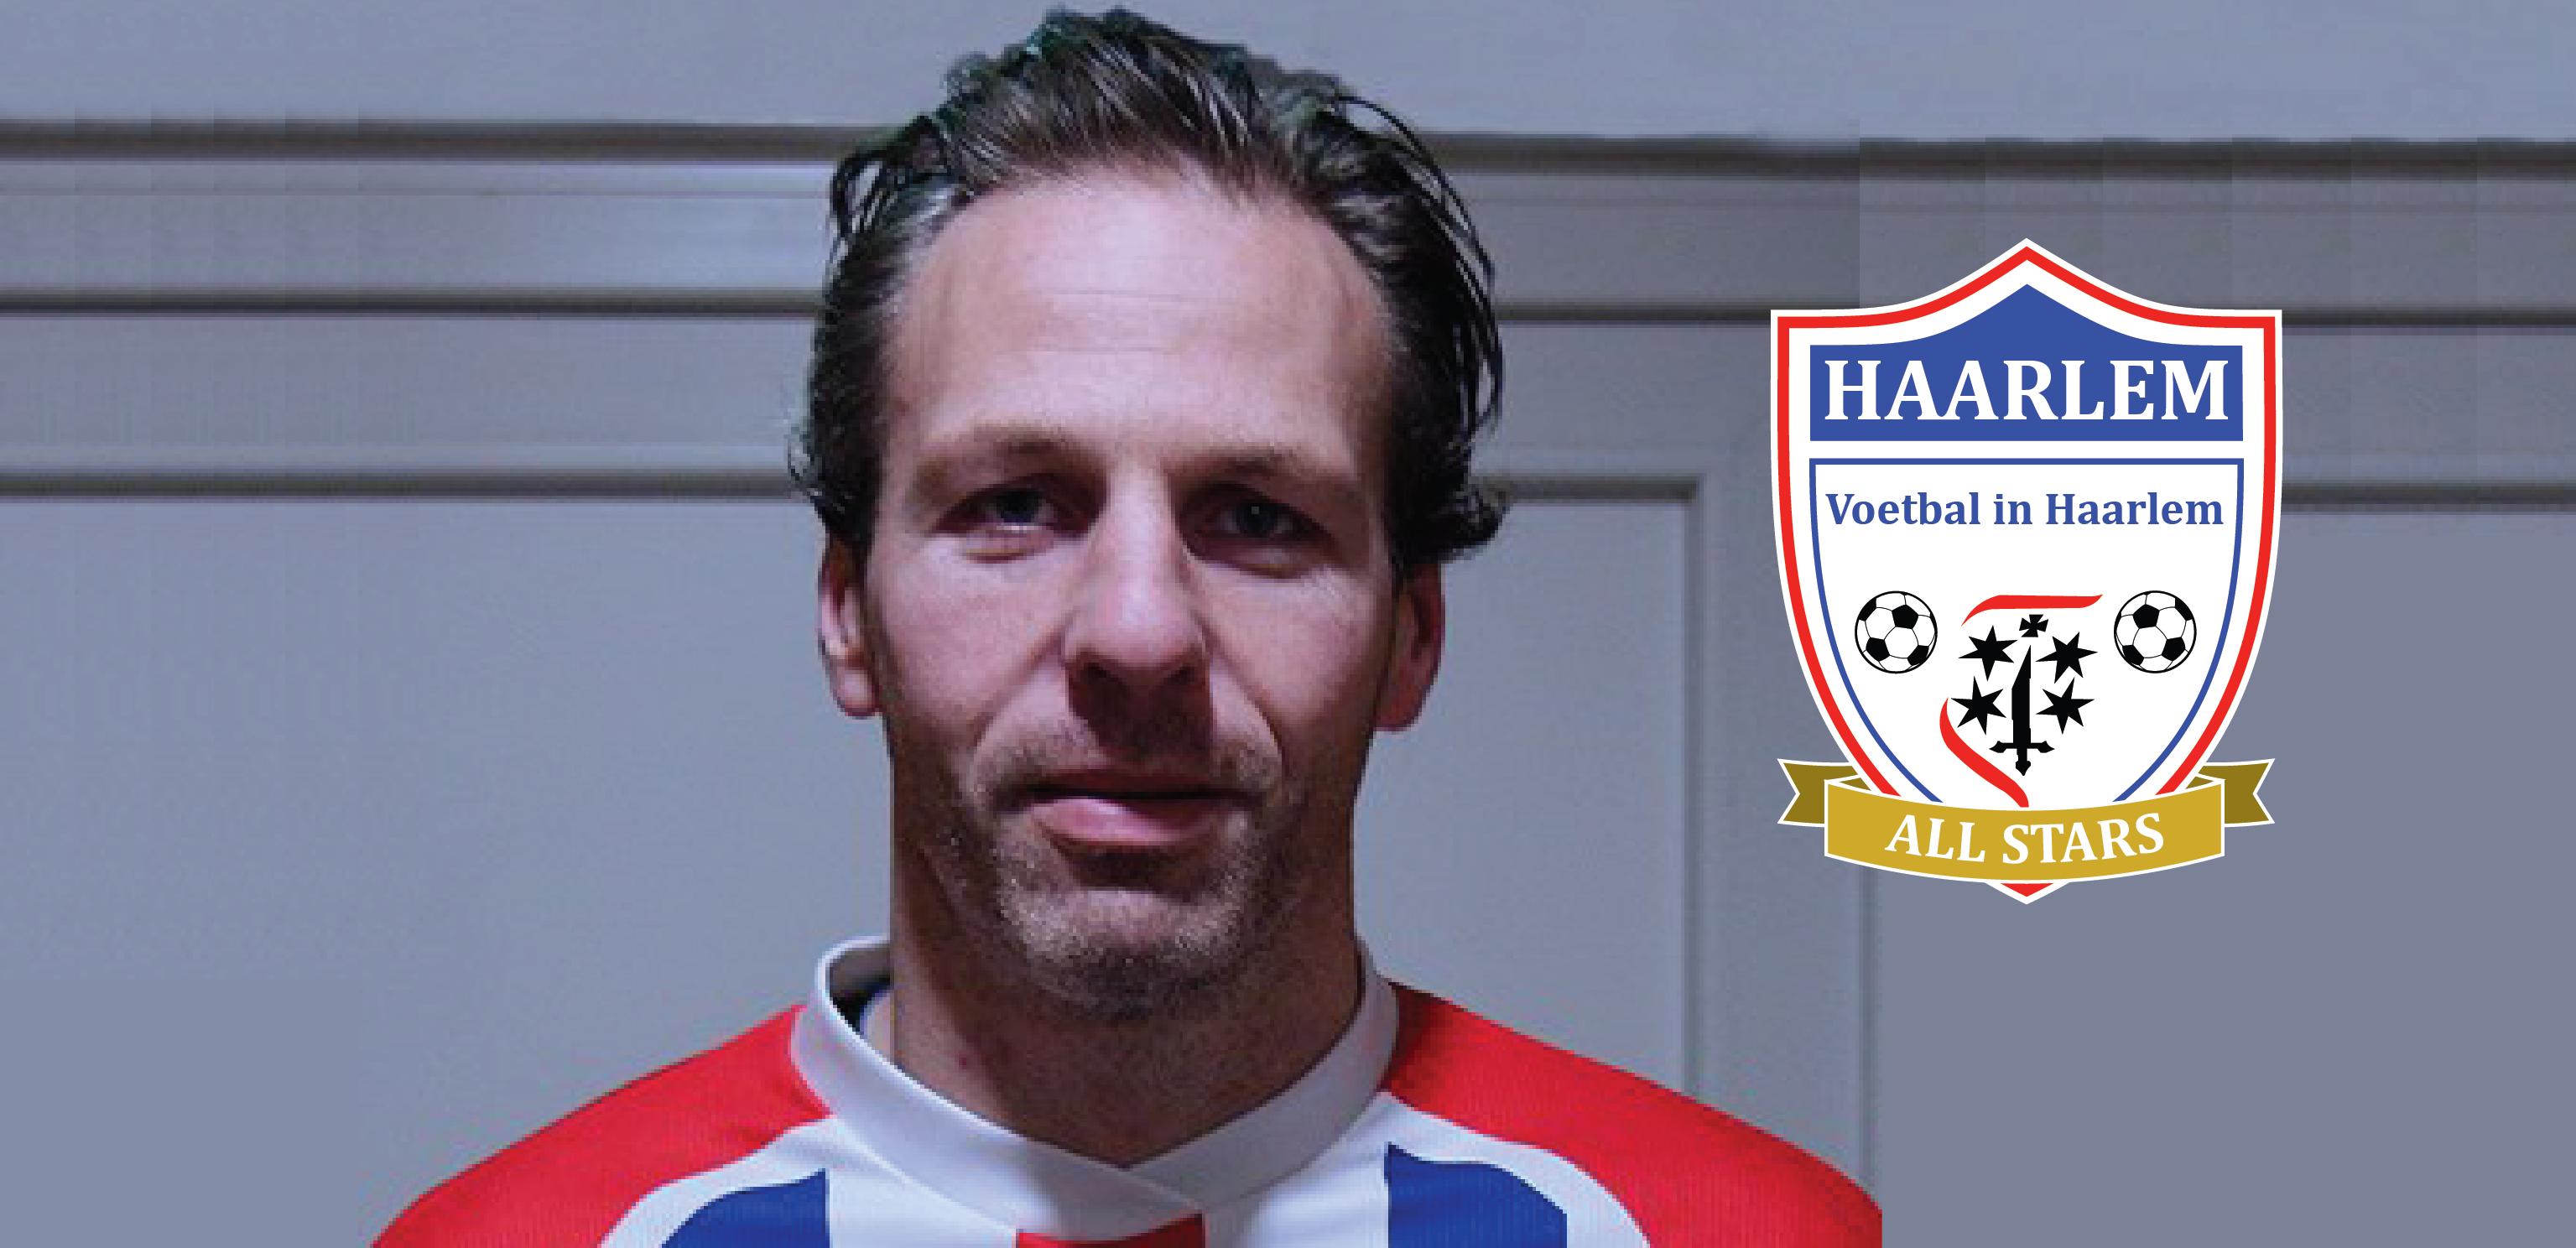 All Stars Olthof - Voetbal in Haarlem